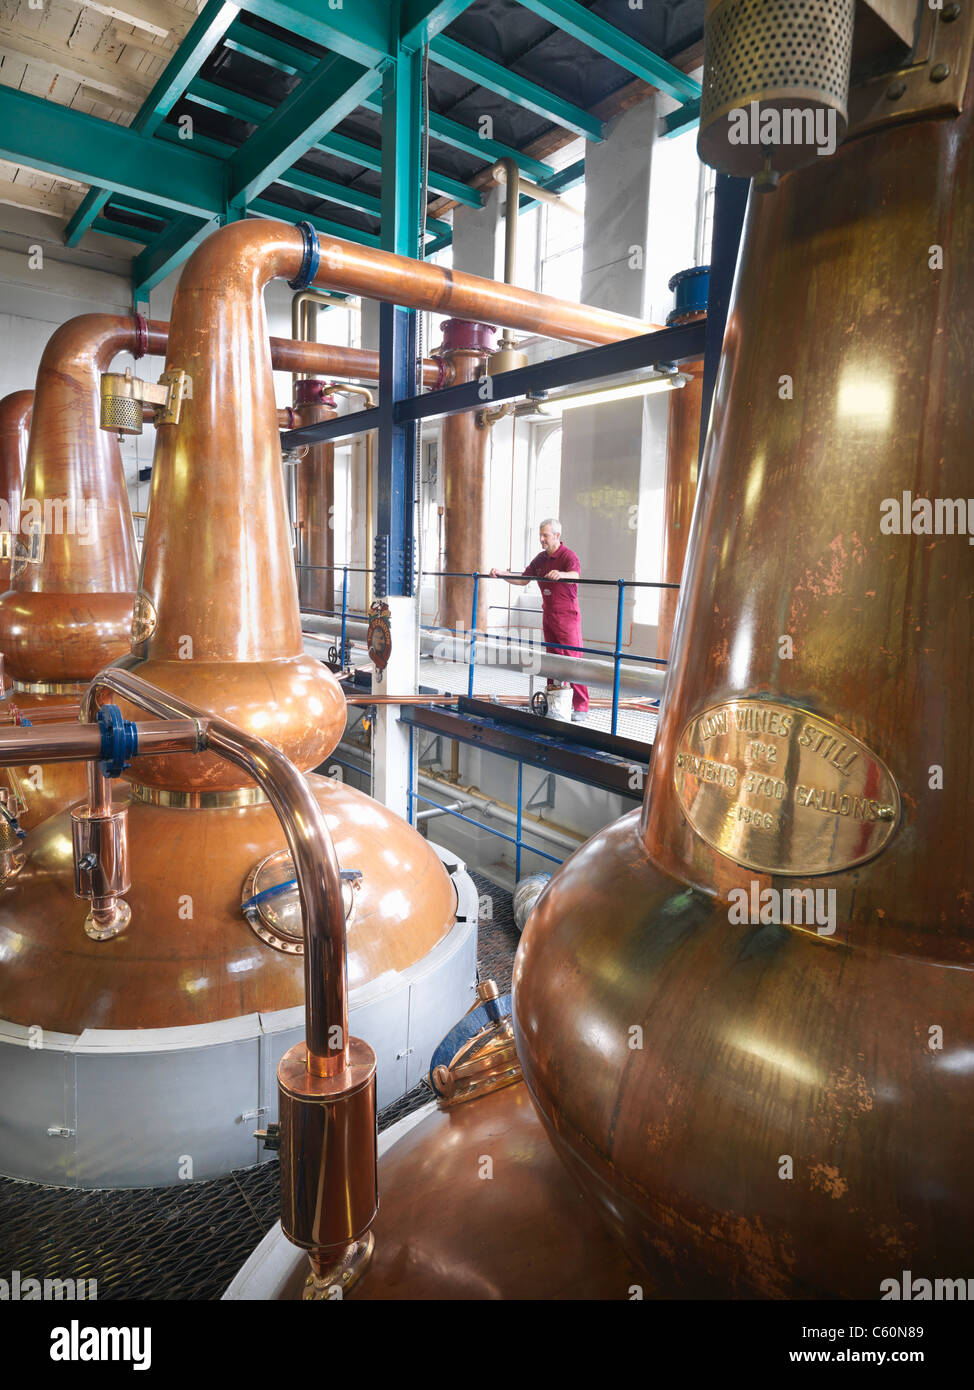 Worker checking stills in distillery - Stock Image